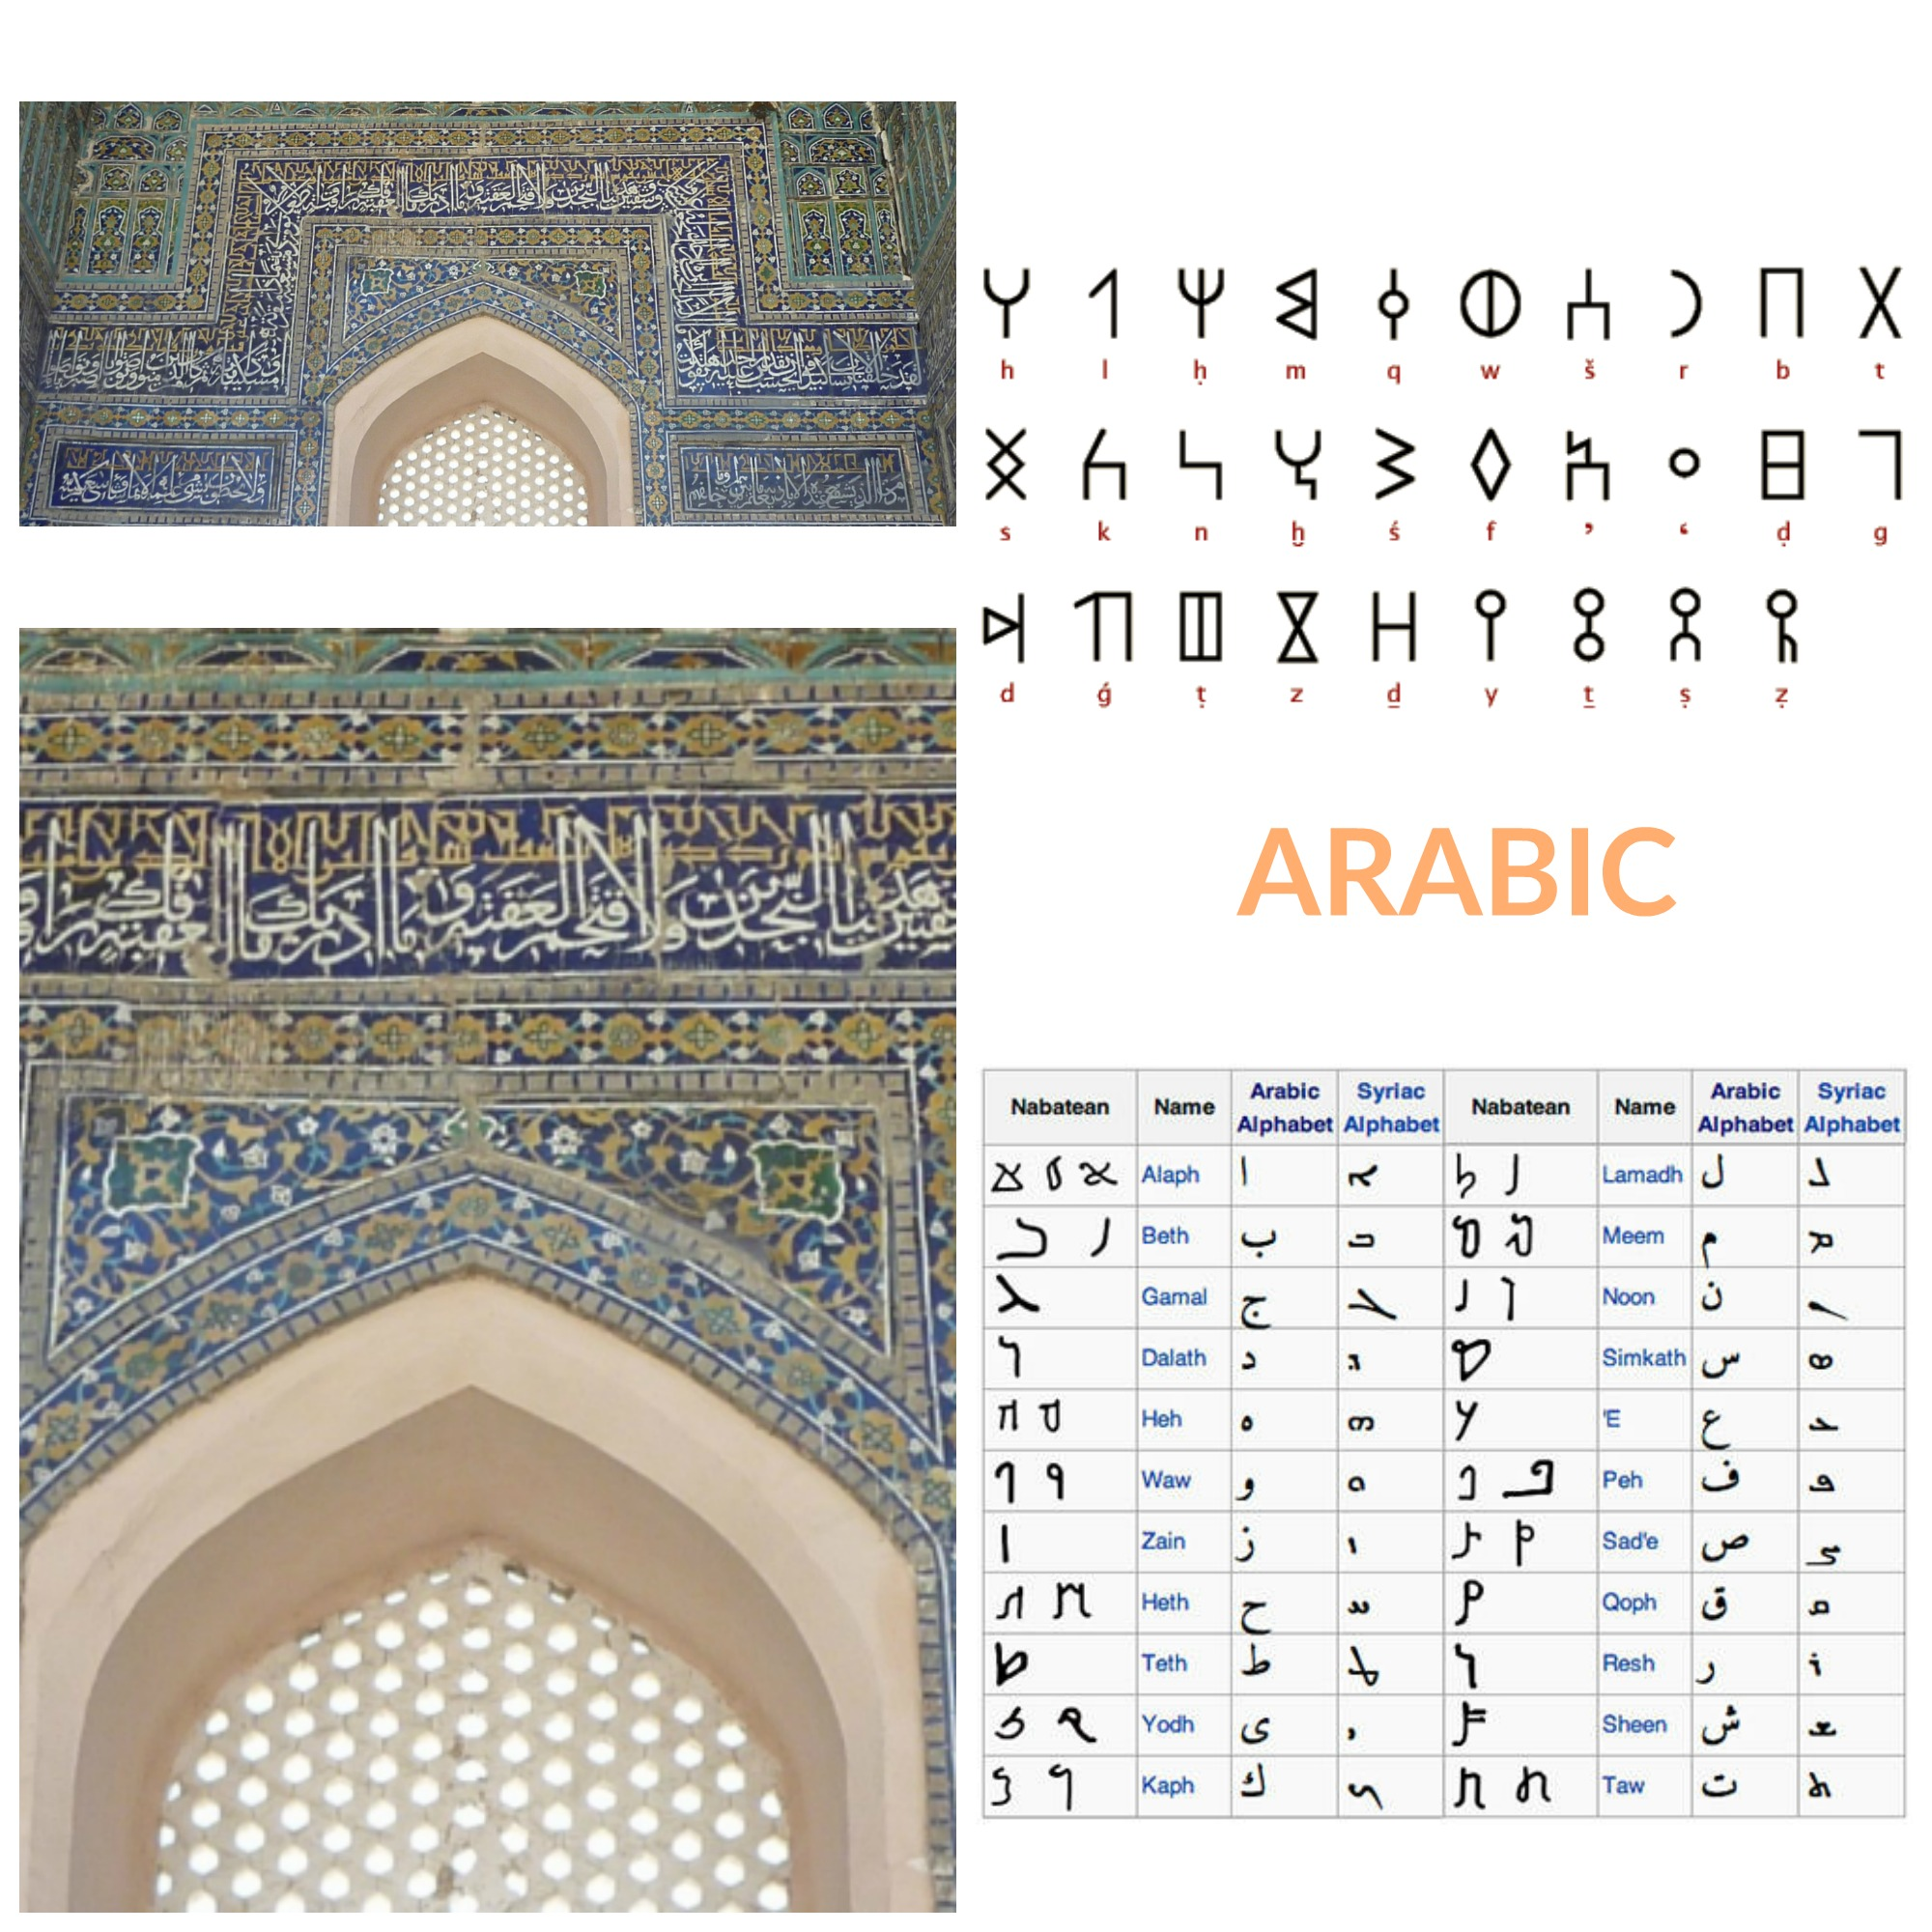 ARABIC COLLAGE